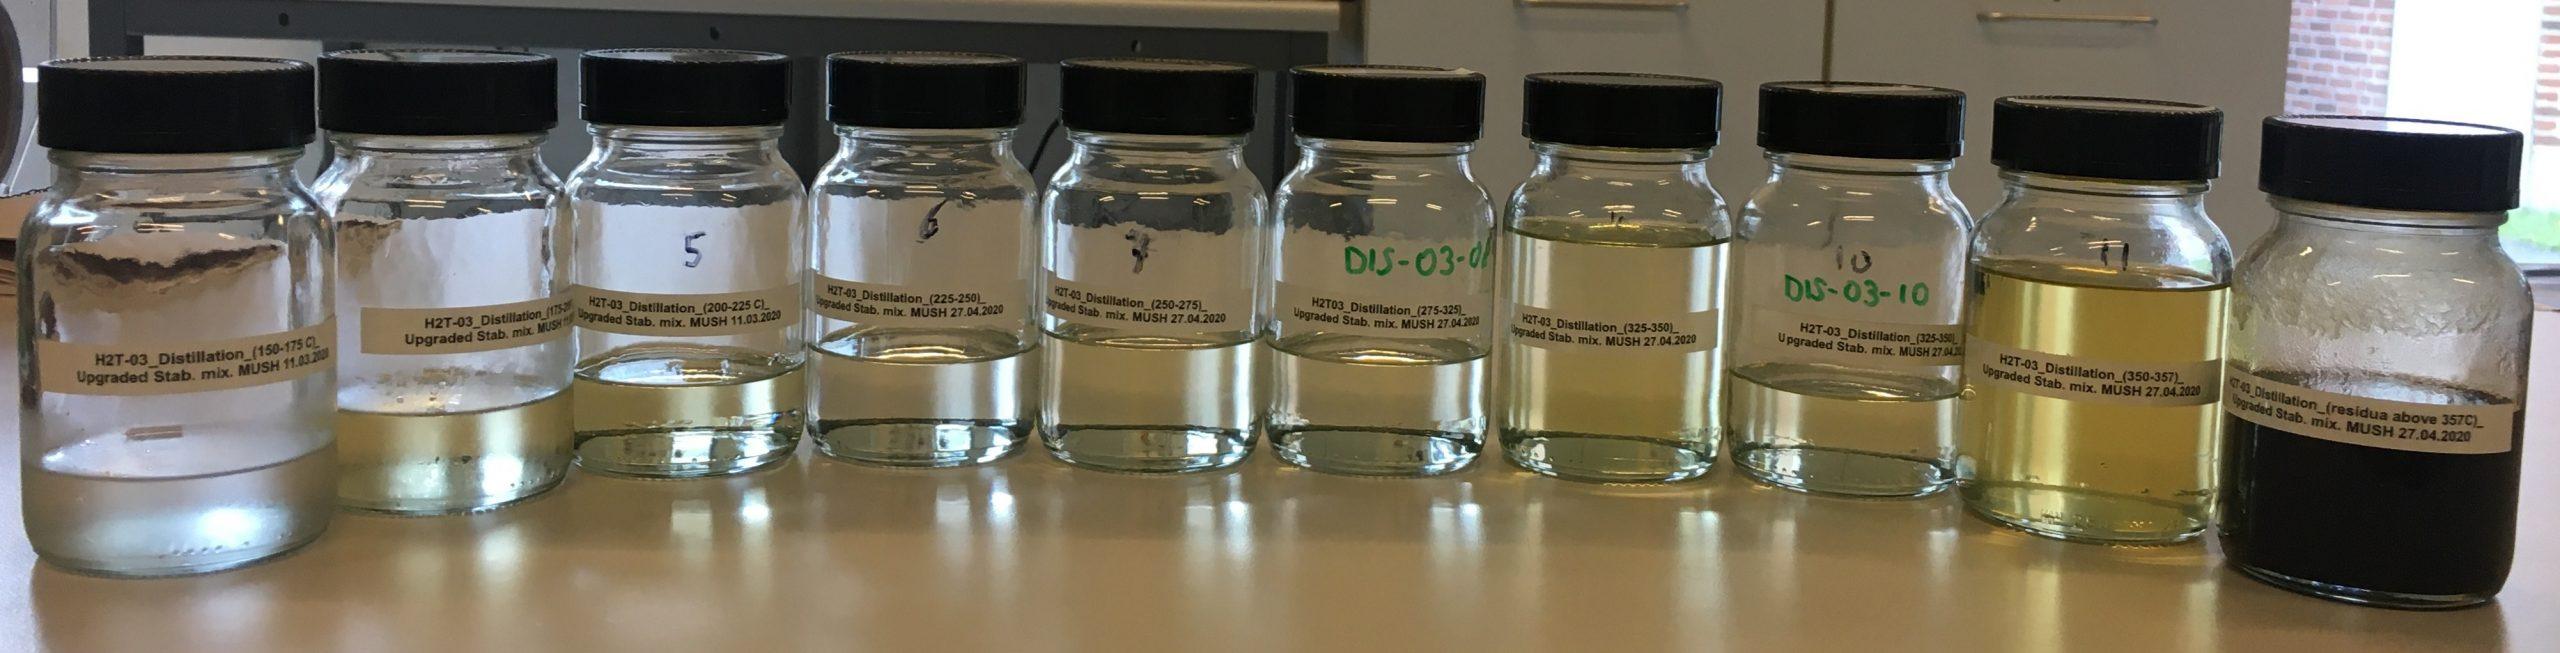 Fuel products distilled from upgraded HTL biocrude. Photo: Muhammad Salman Haider. Copyright: Aalborg University